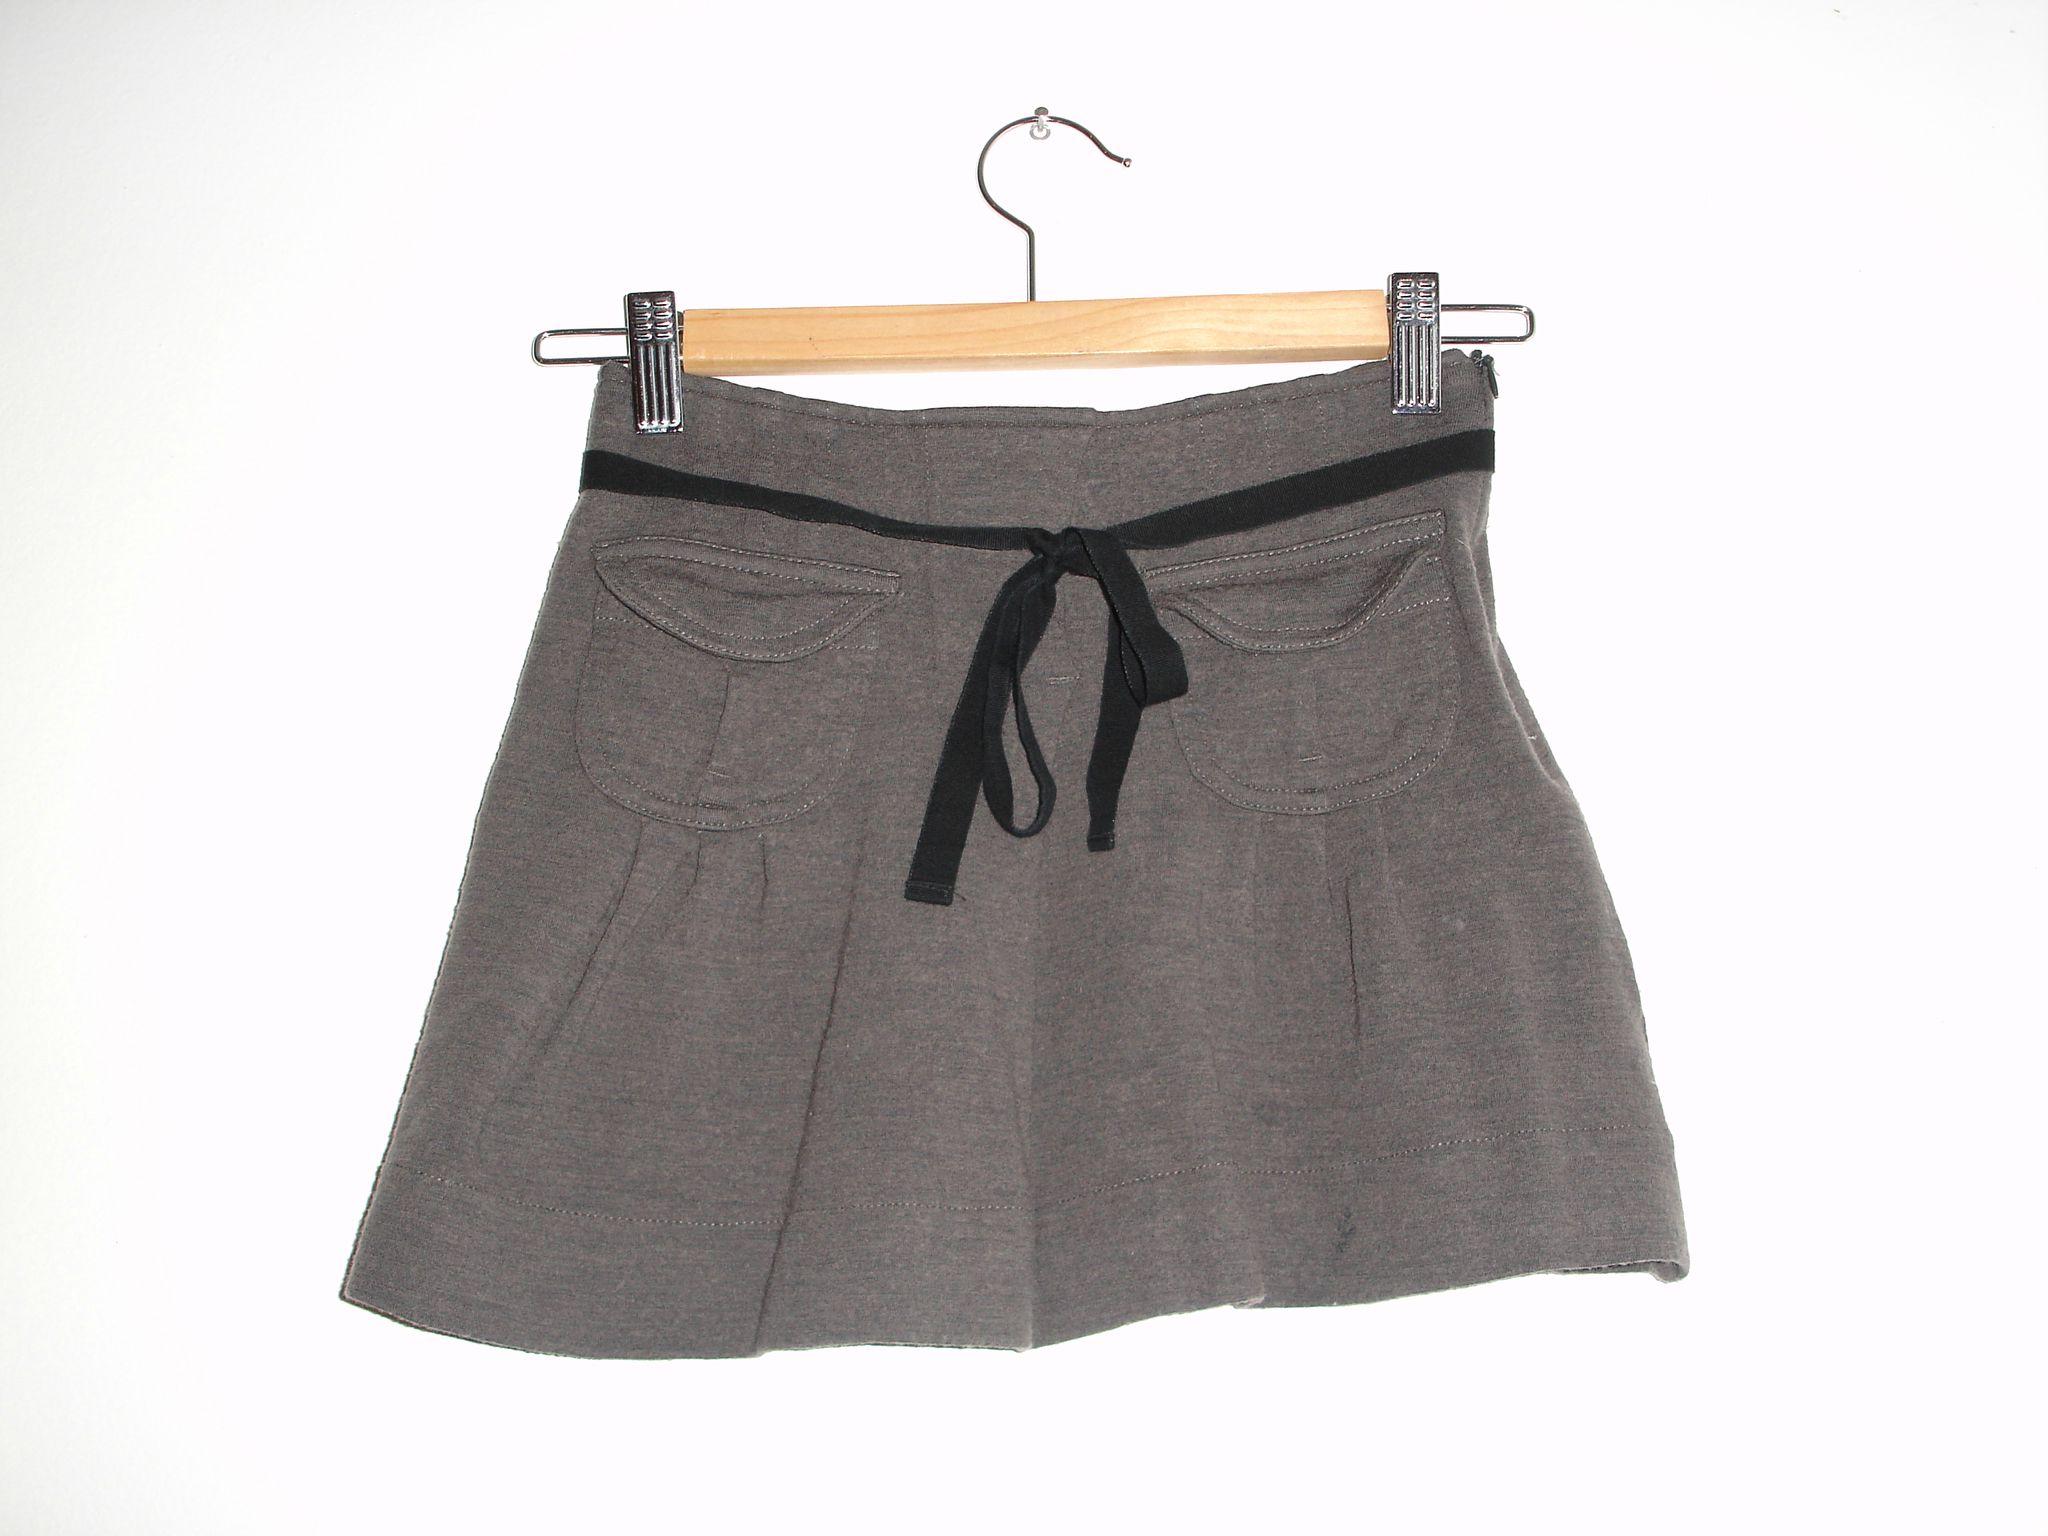 Mini jupe comptoir des cotonniers beautiful vide dressing - Vide dressing comptoir des cotonniers ...